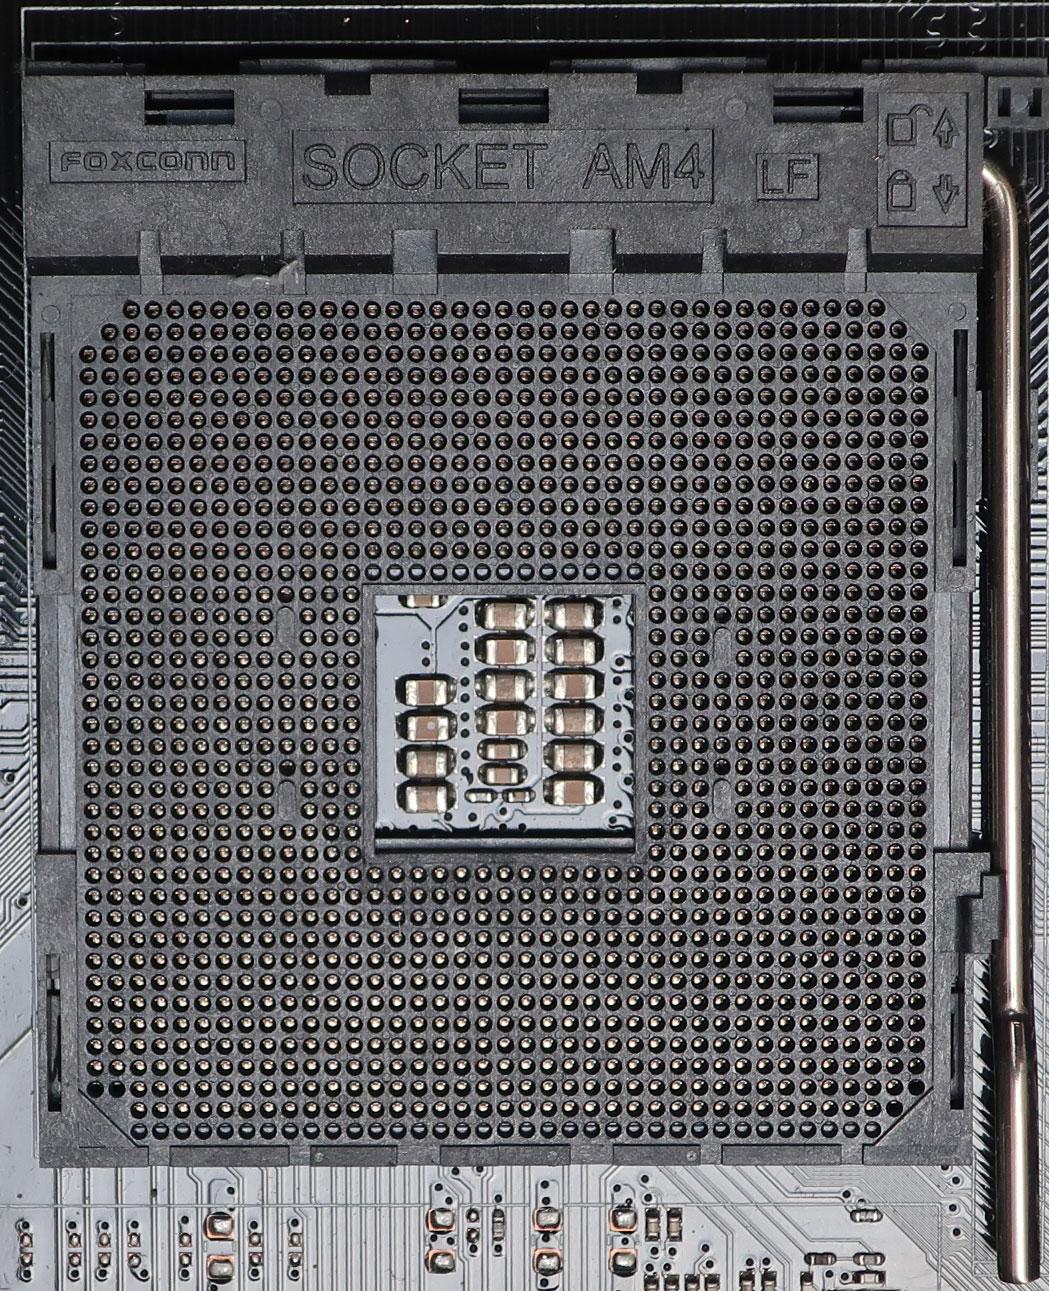 Jenis-jenis Socket Processor AMD dan Penjelasannya